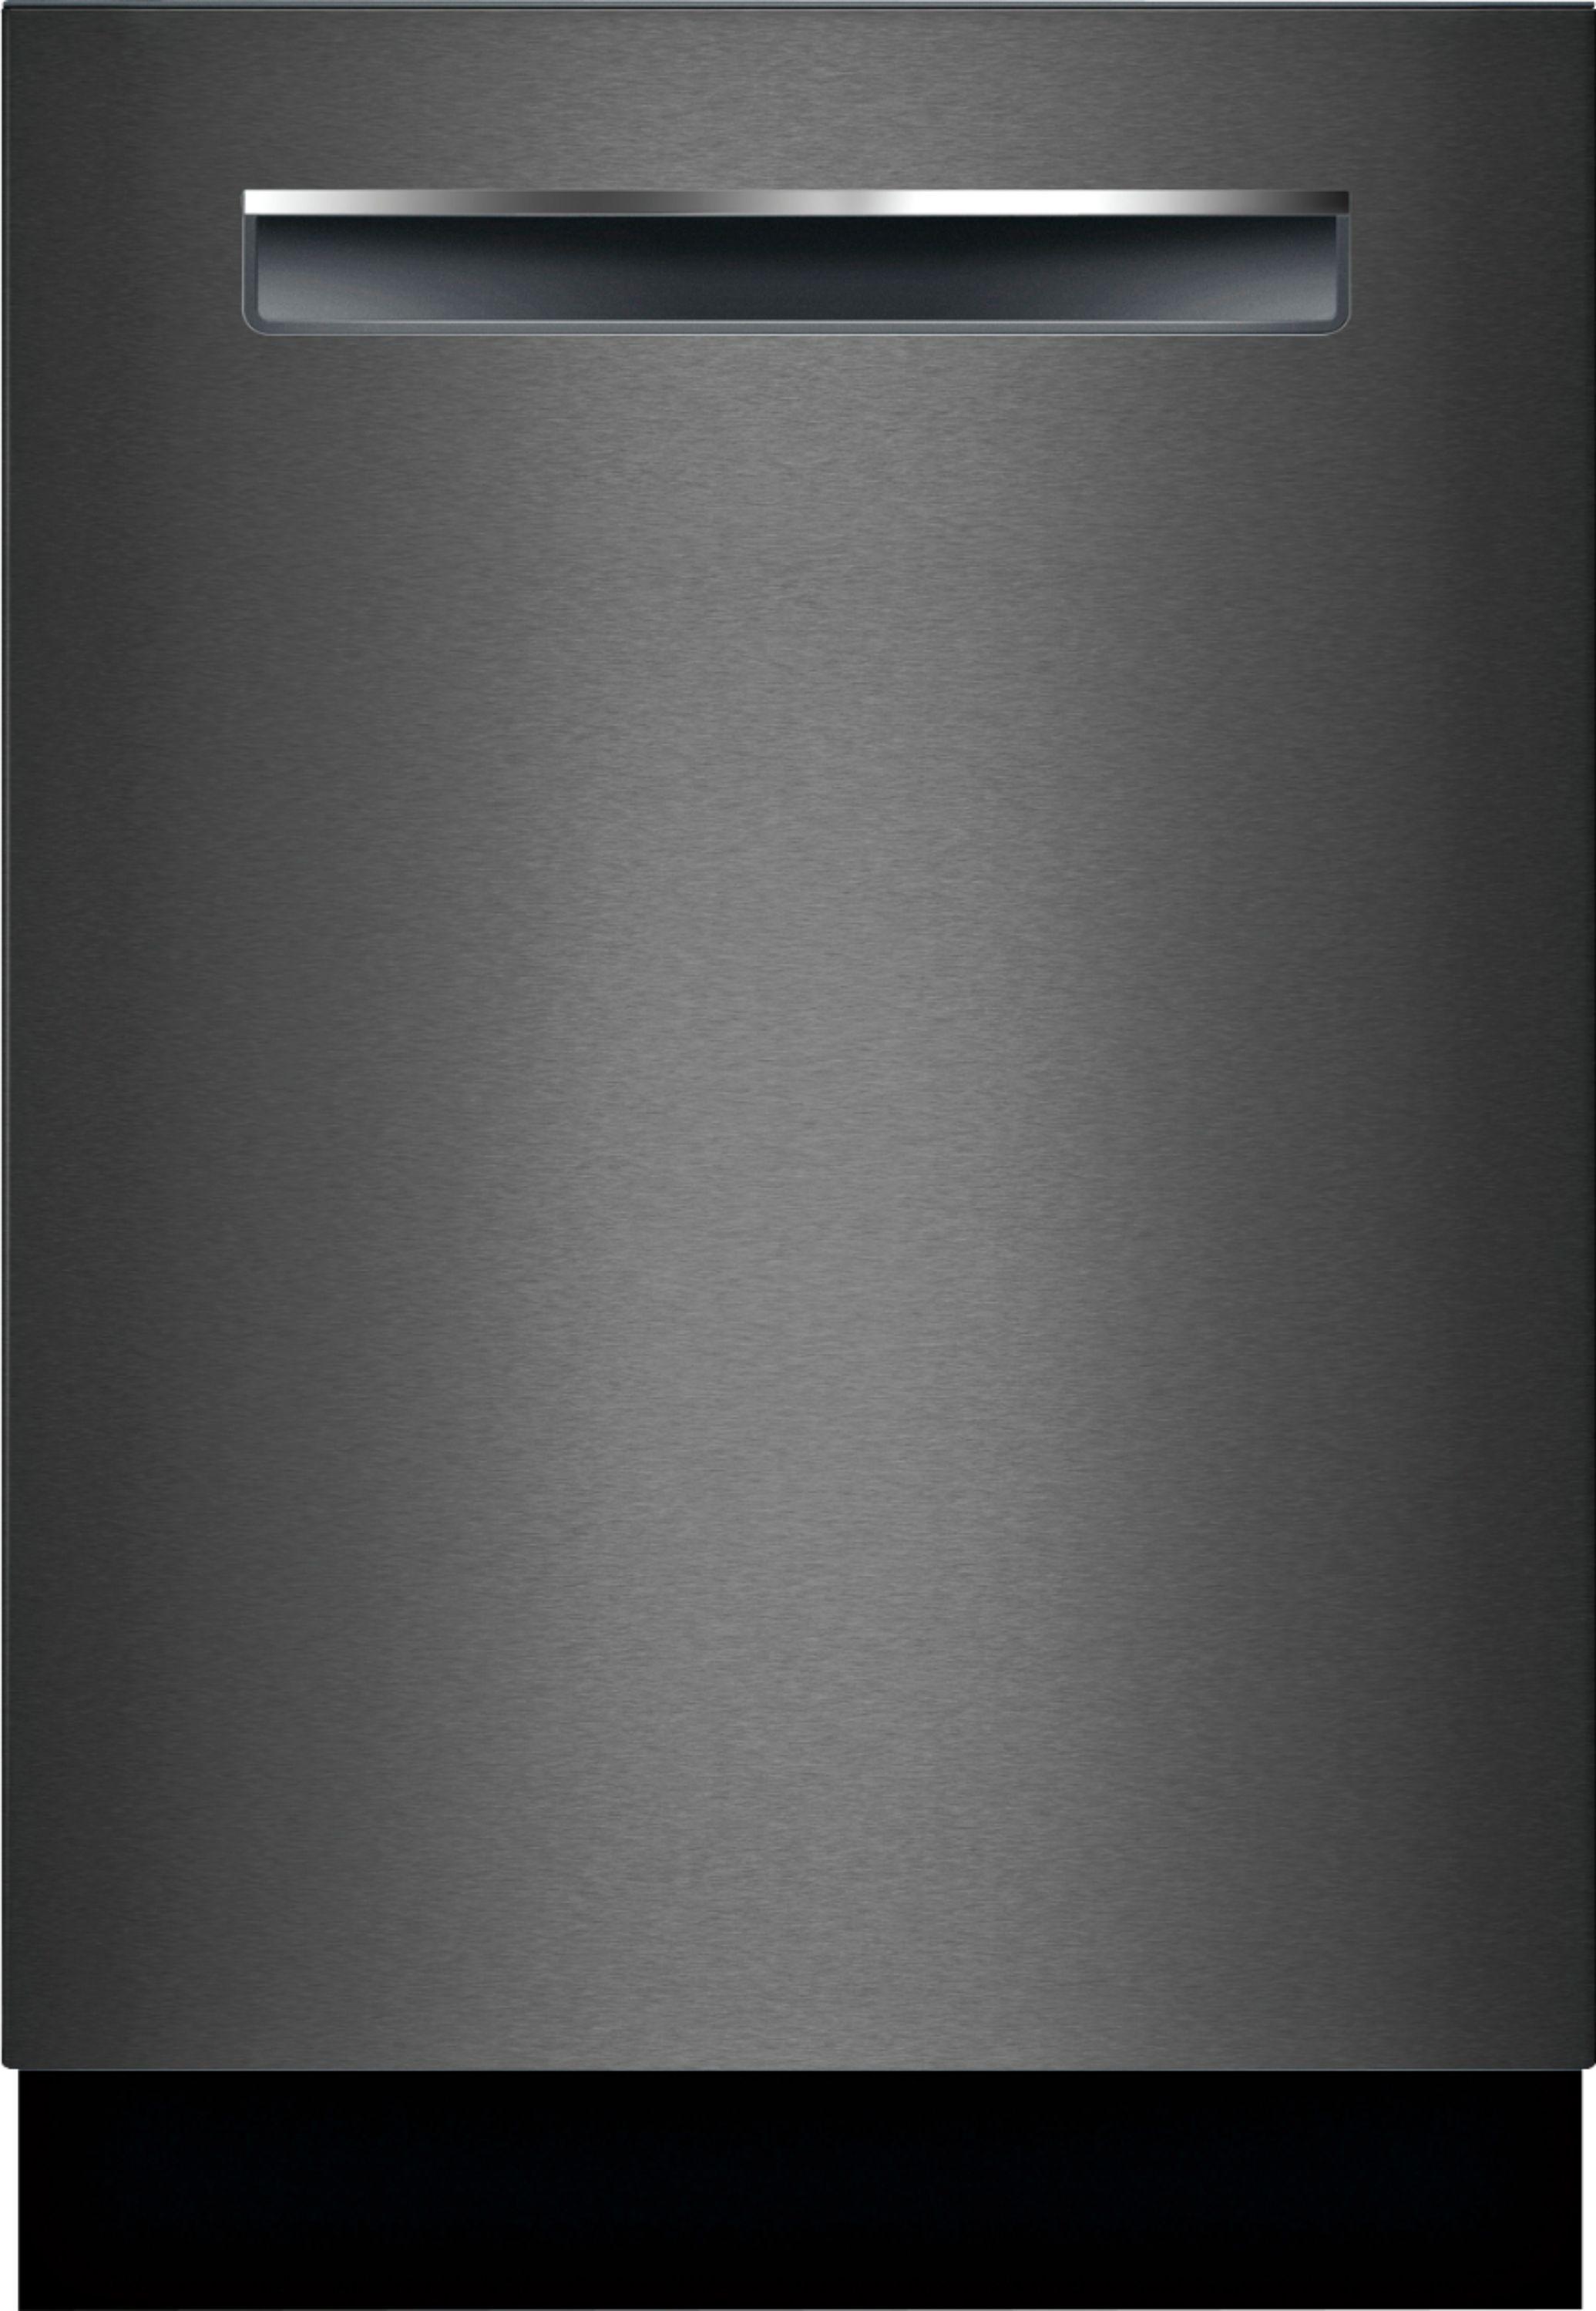 Bosch 800 Series 24 Top Control Built In Dishwasher With Crystaldry Stainless Steel Tub 3rd Rack 42 Dba Black Stainless Steel Shpm78z54n Best Buy In 2020 Steel Tub Built In Dishwasher Integrated Dishwasher